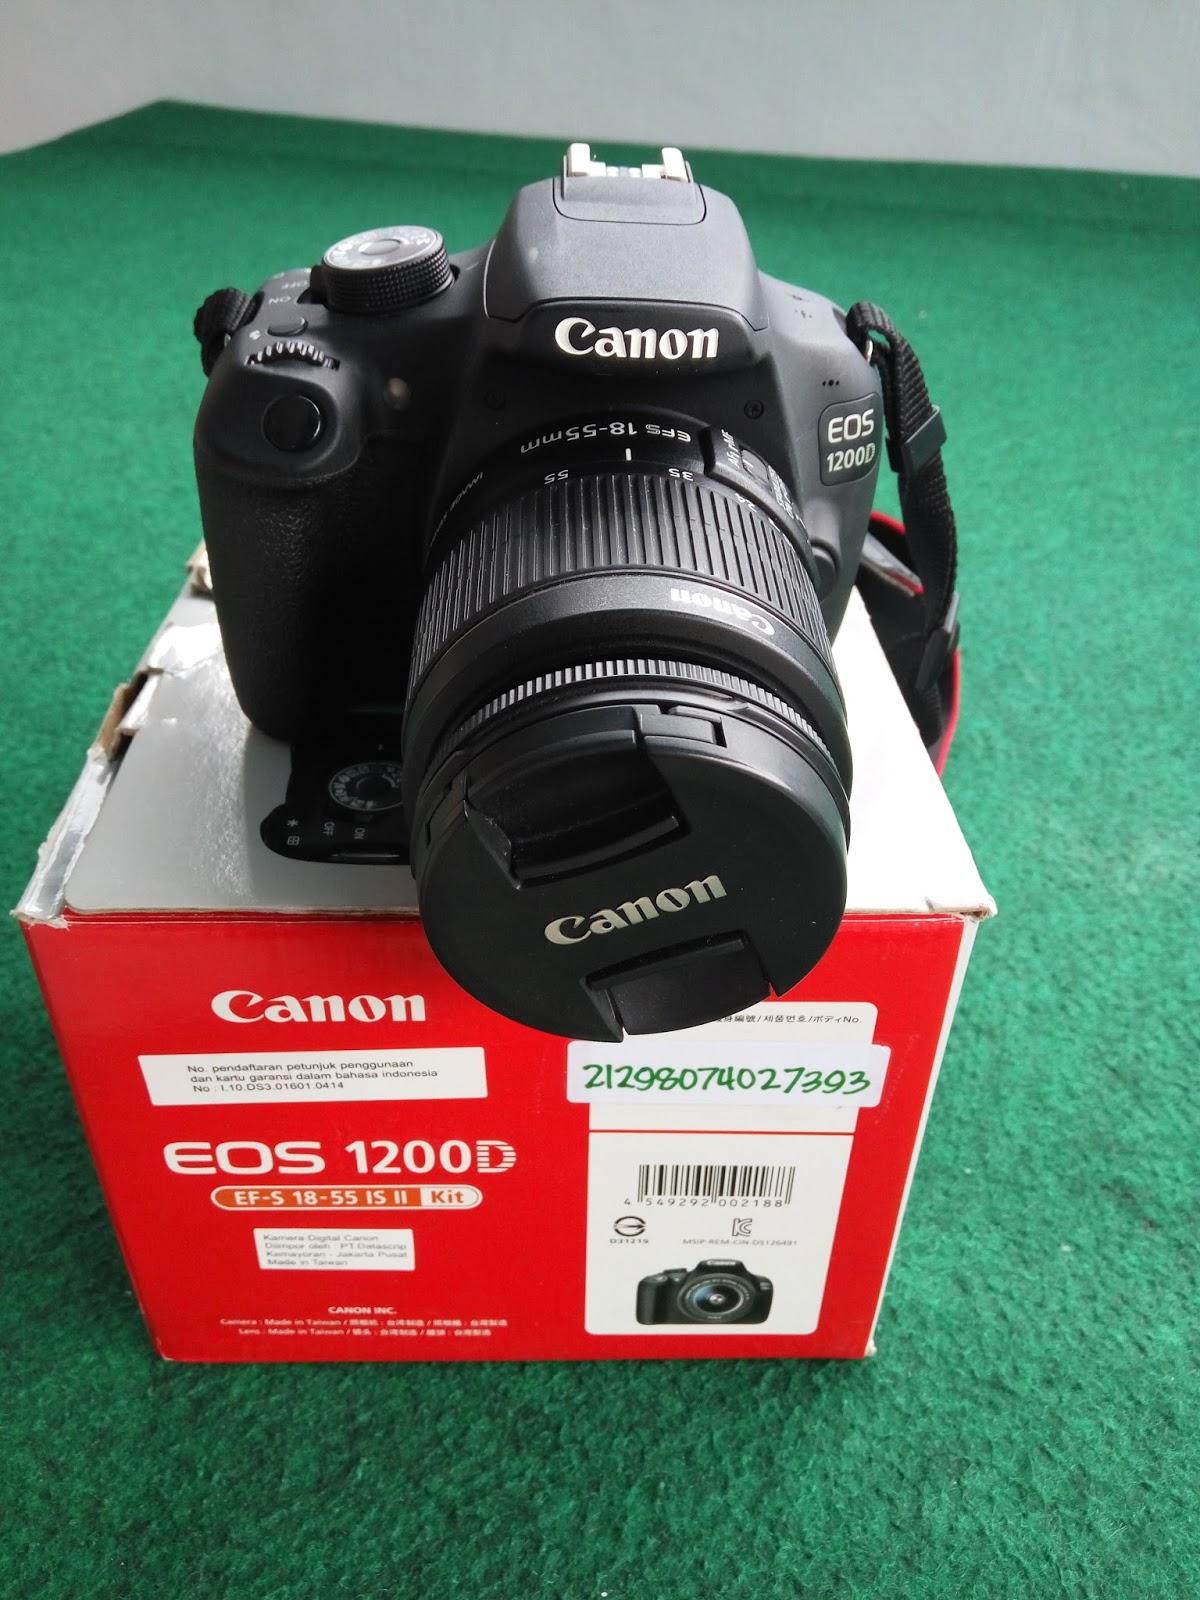 Harga Kamera Dslr Canon Eos 1200d Bekas Lensa 18 55mm Kit Jual Unyu Fulset